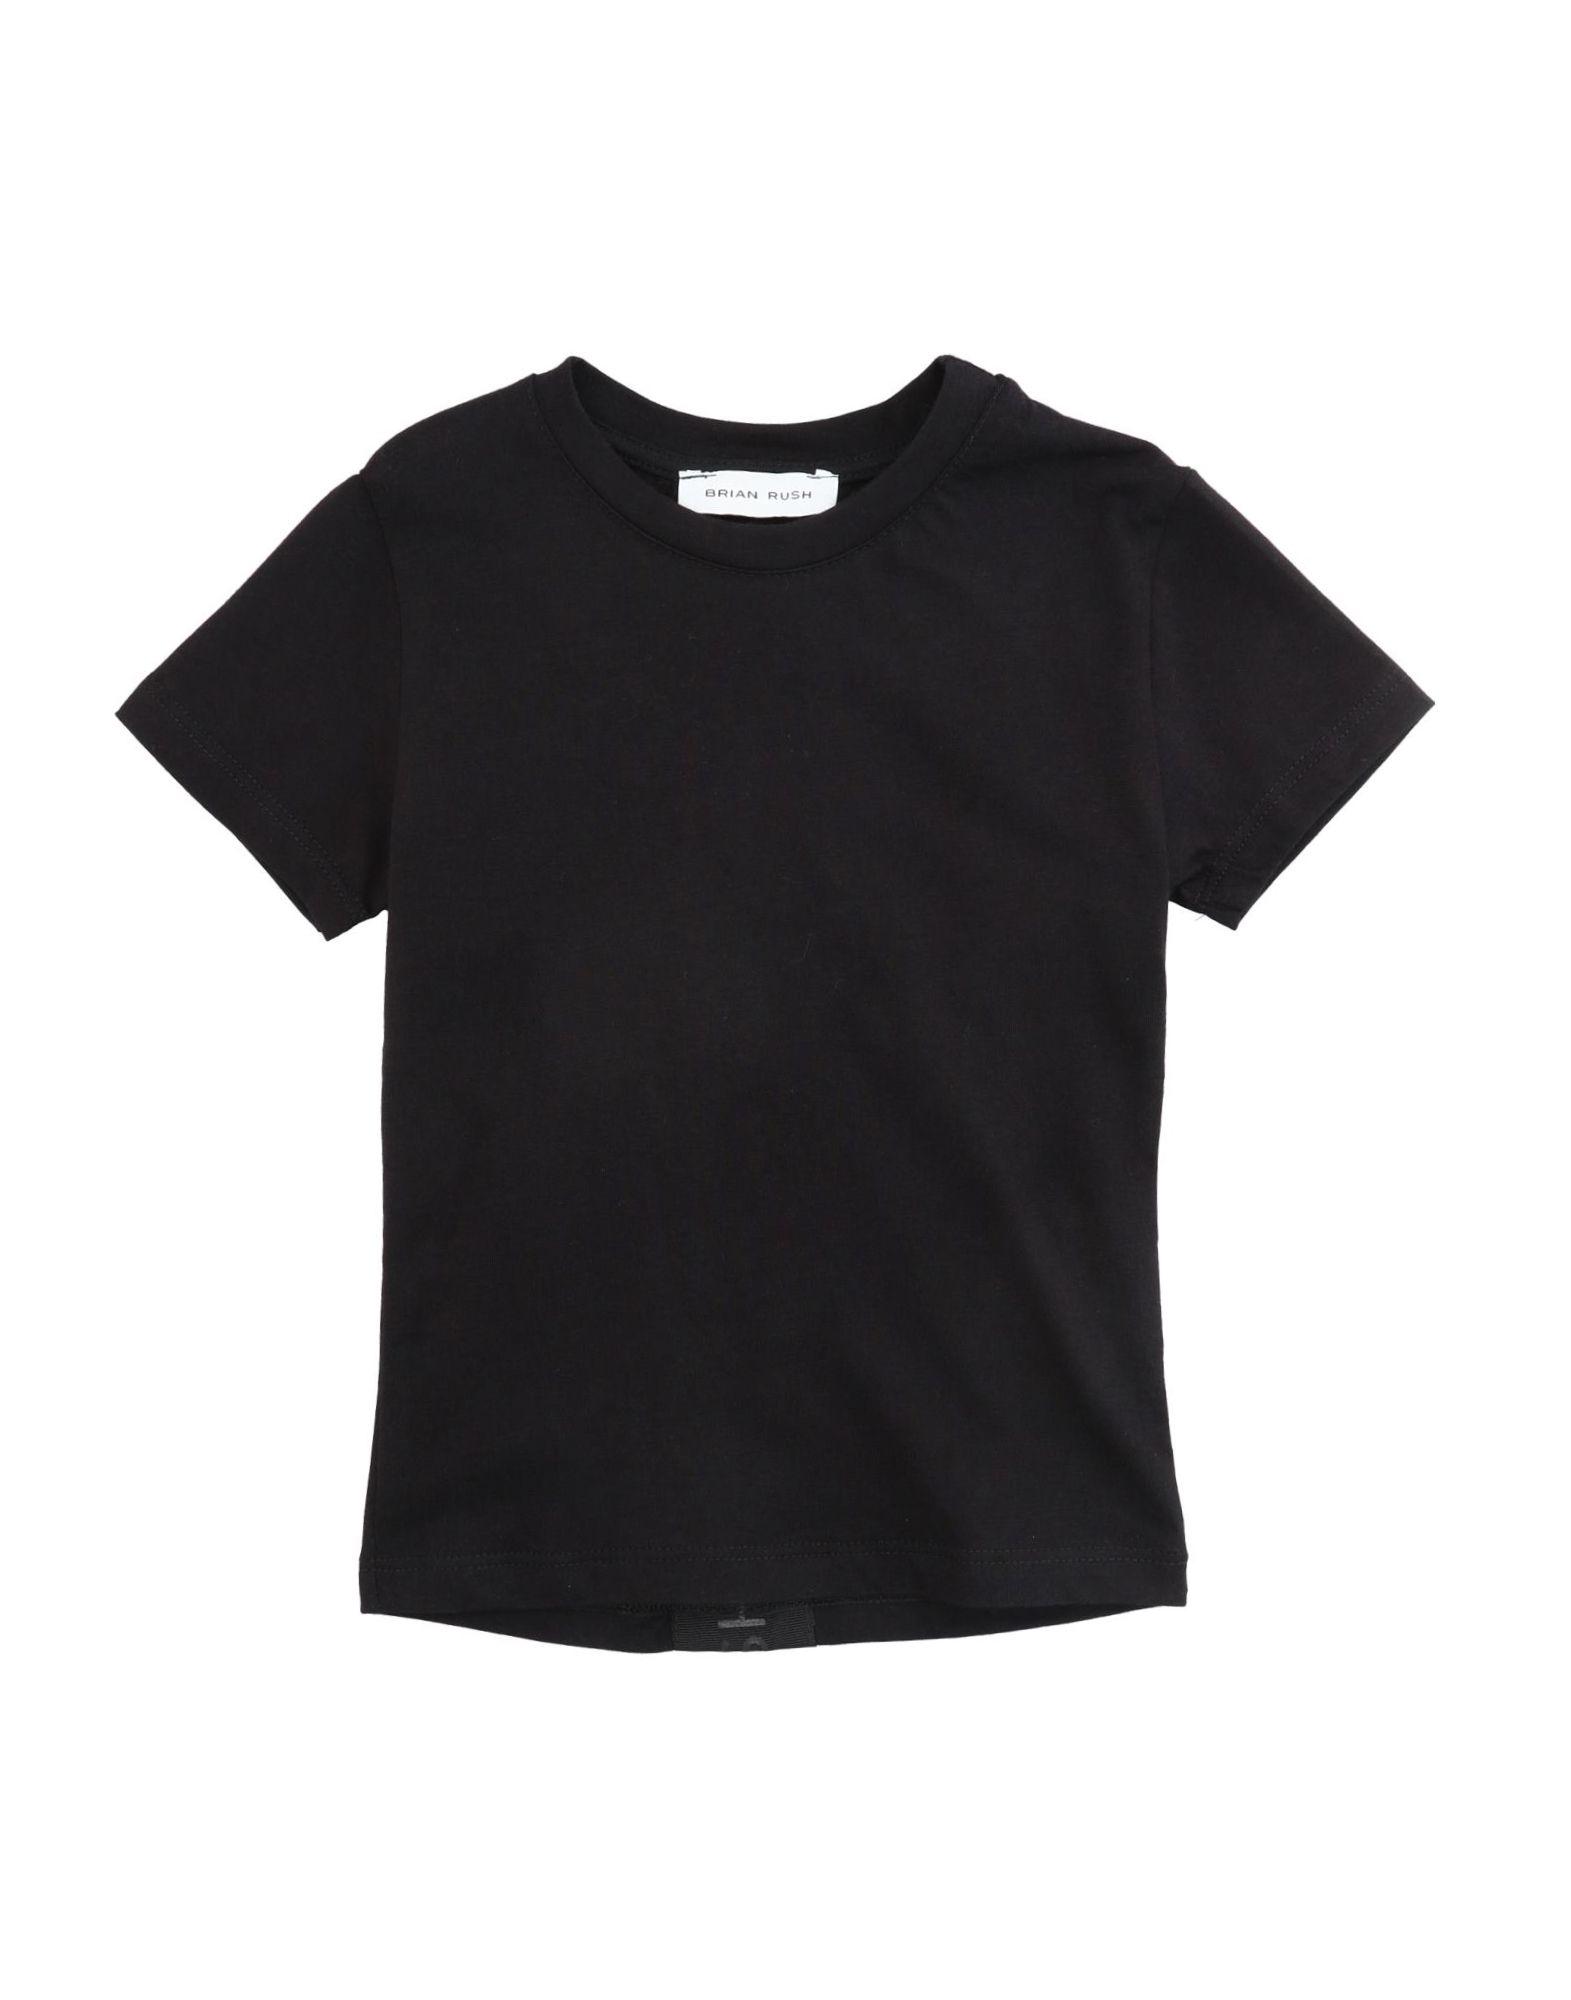 Brian Rush Kids' T-shirts In Black